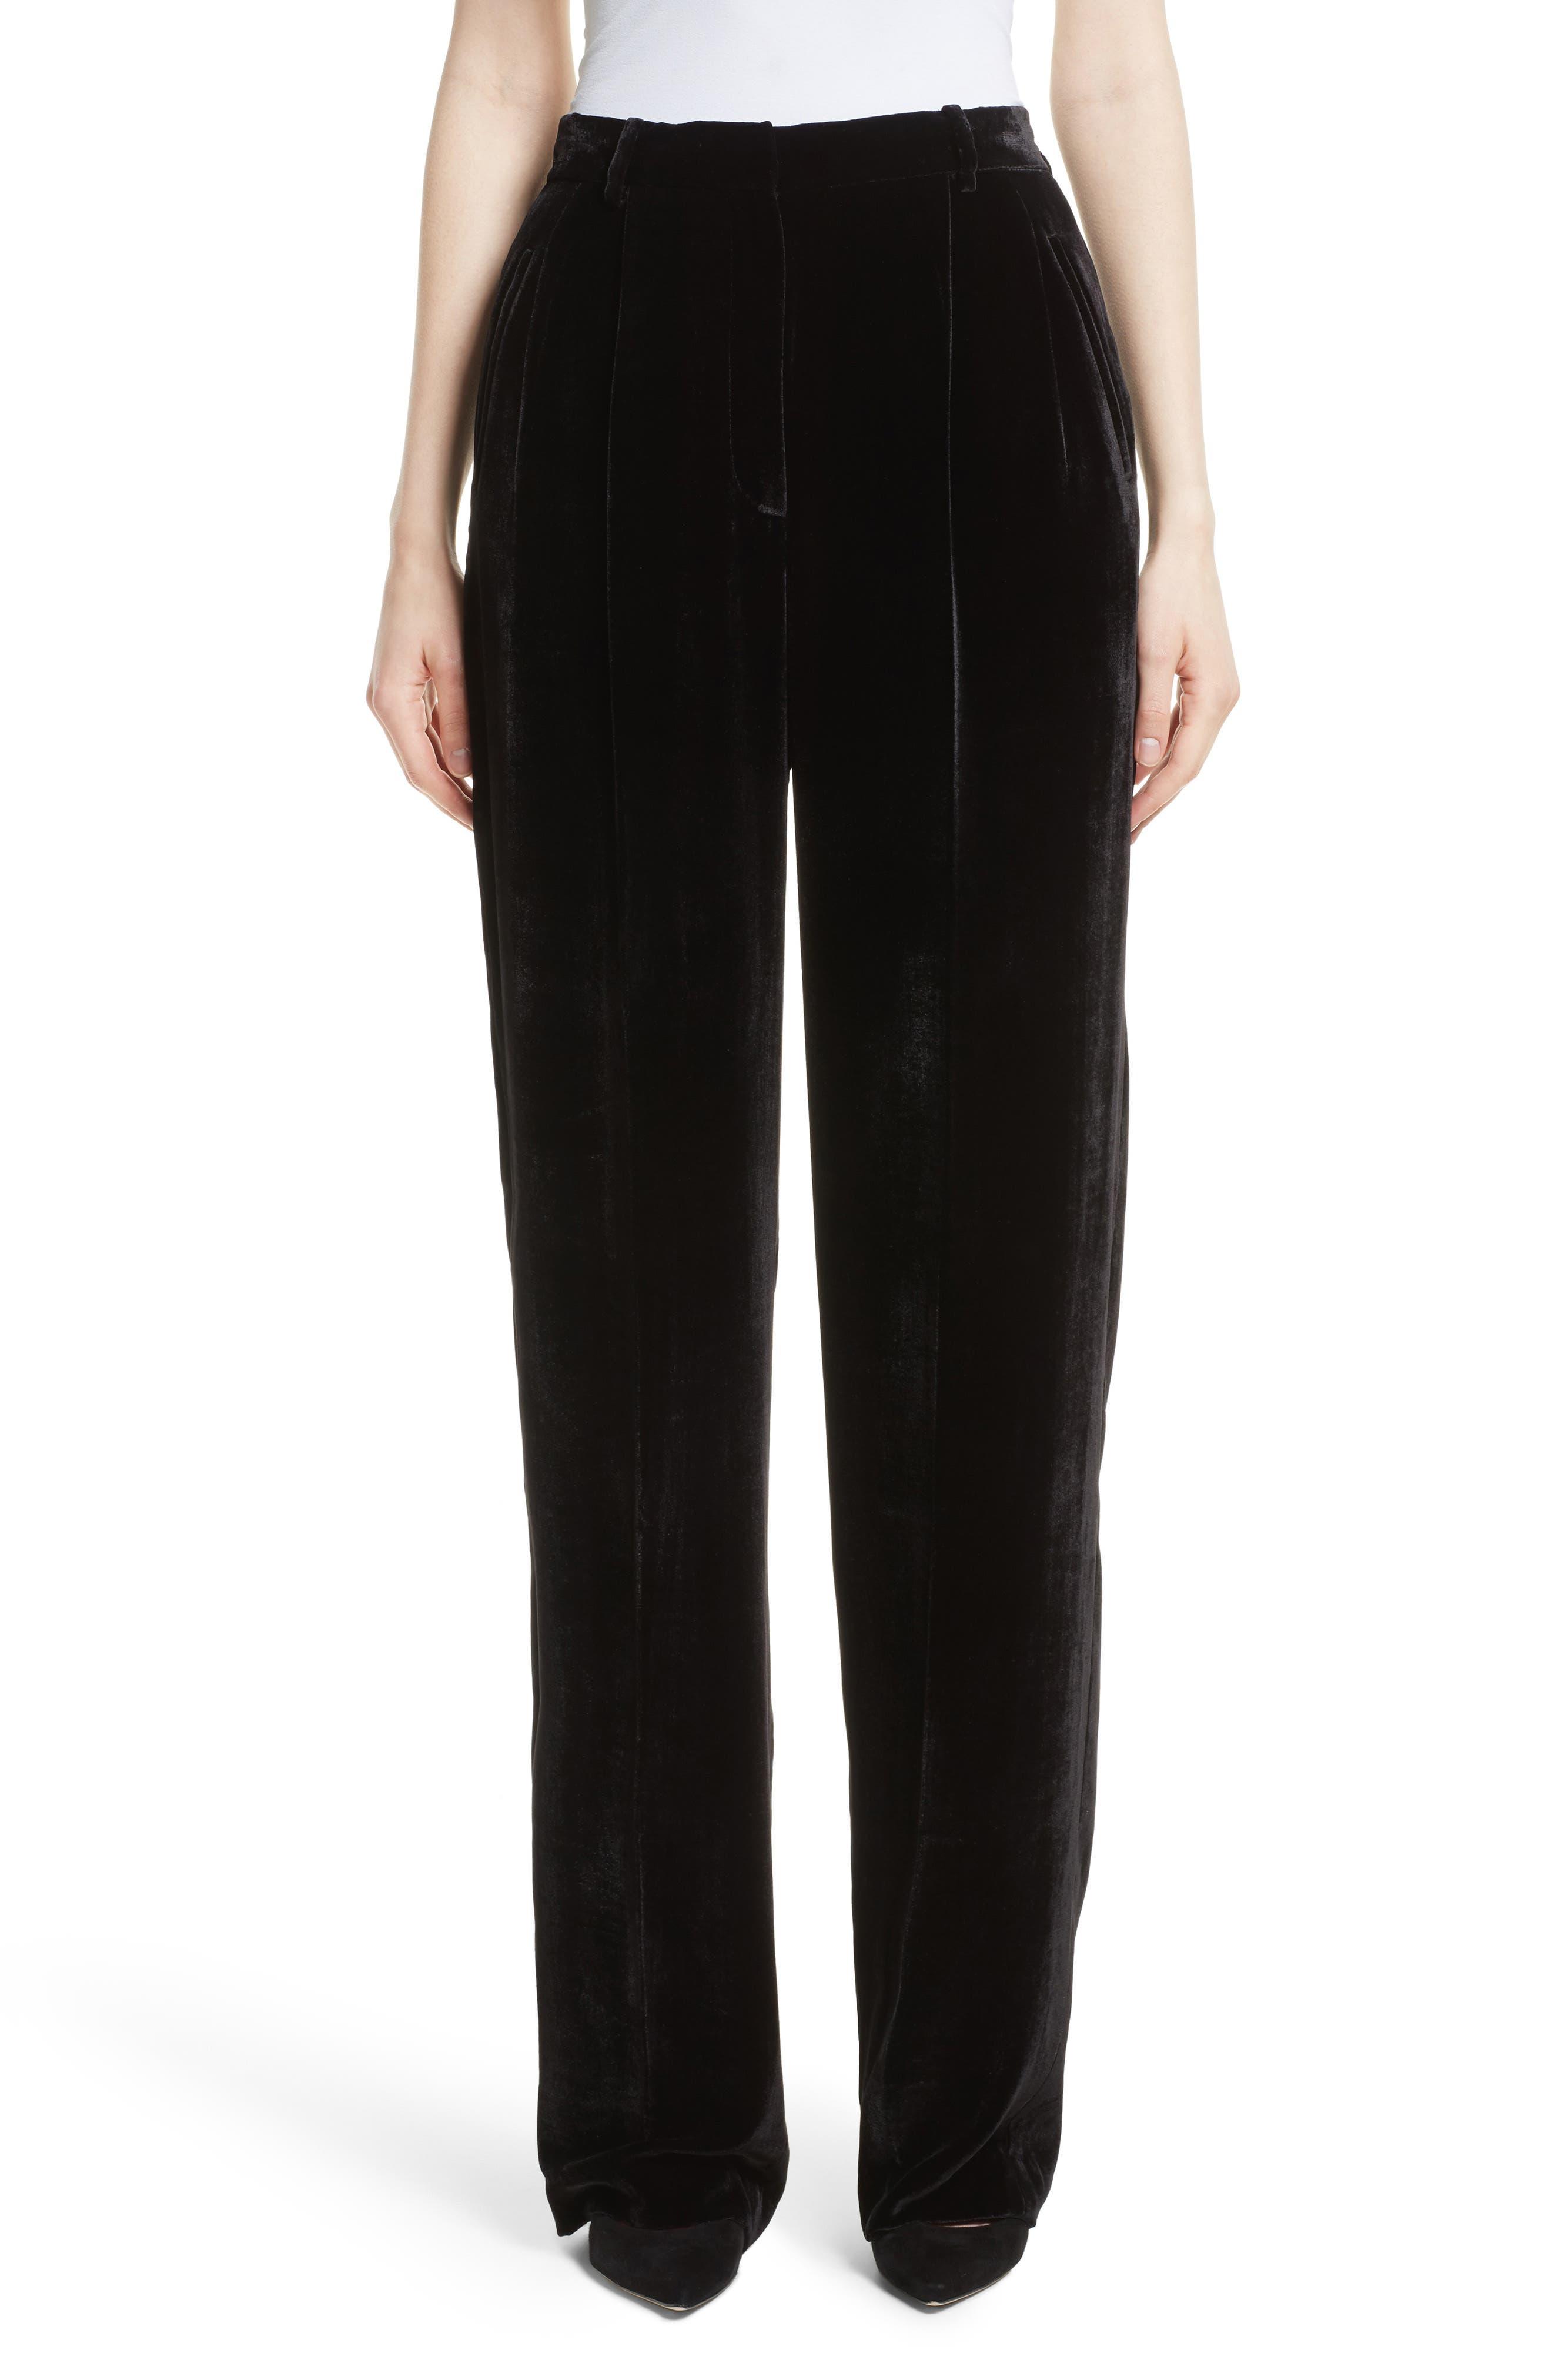 High Waist Luxe Velvet Pants,                             Main thumbnail 1, color,                             001